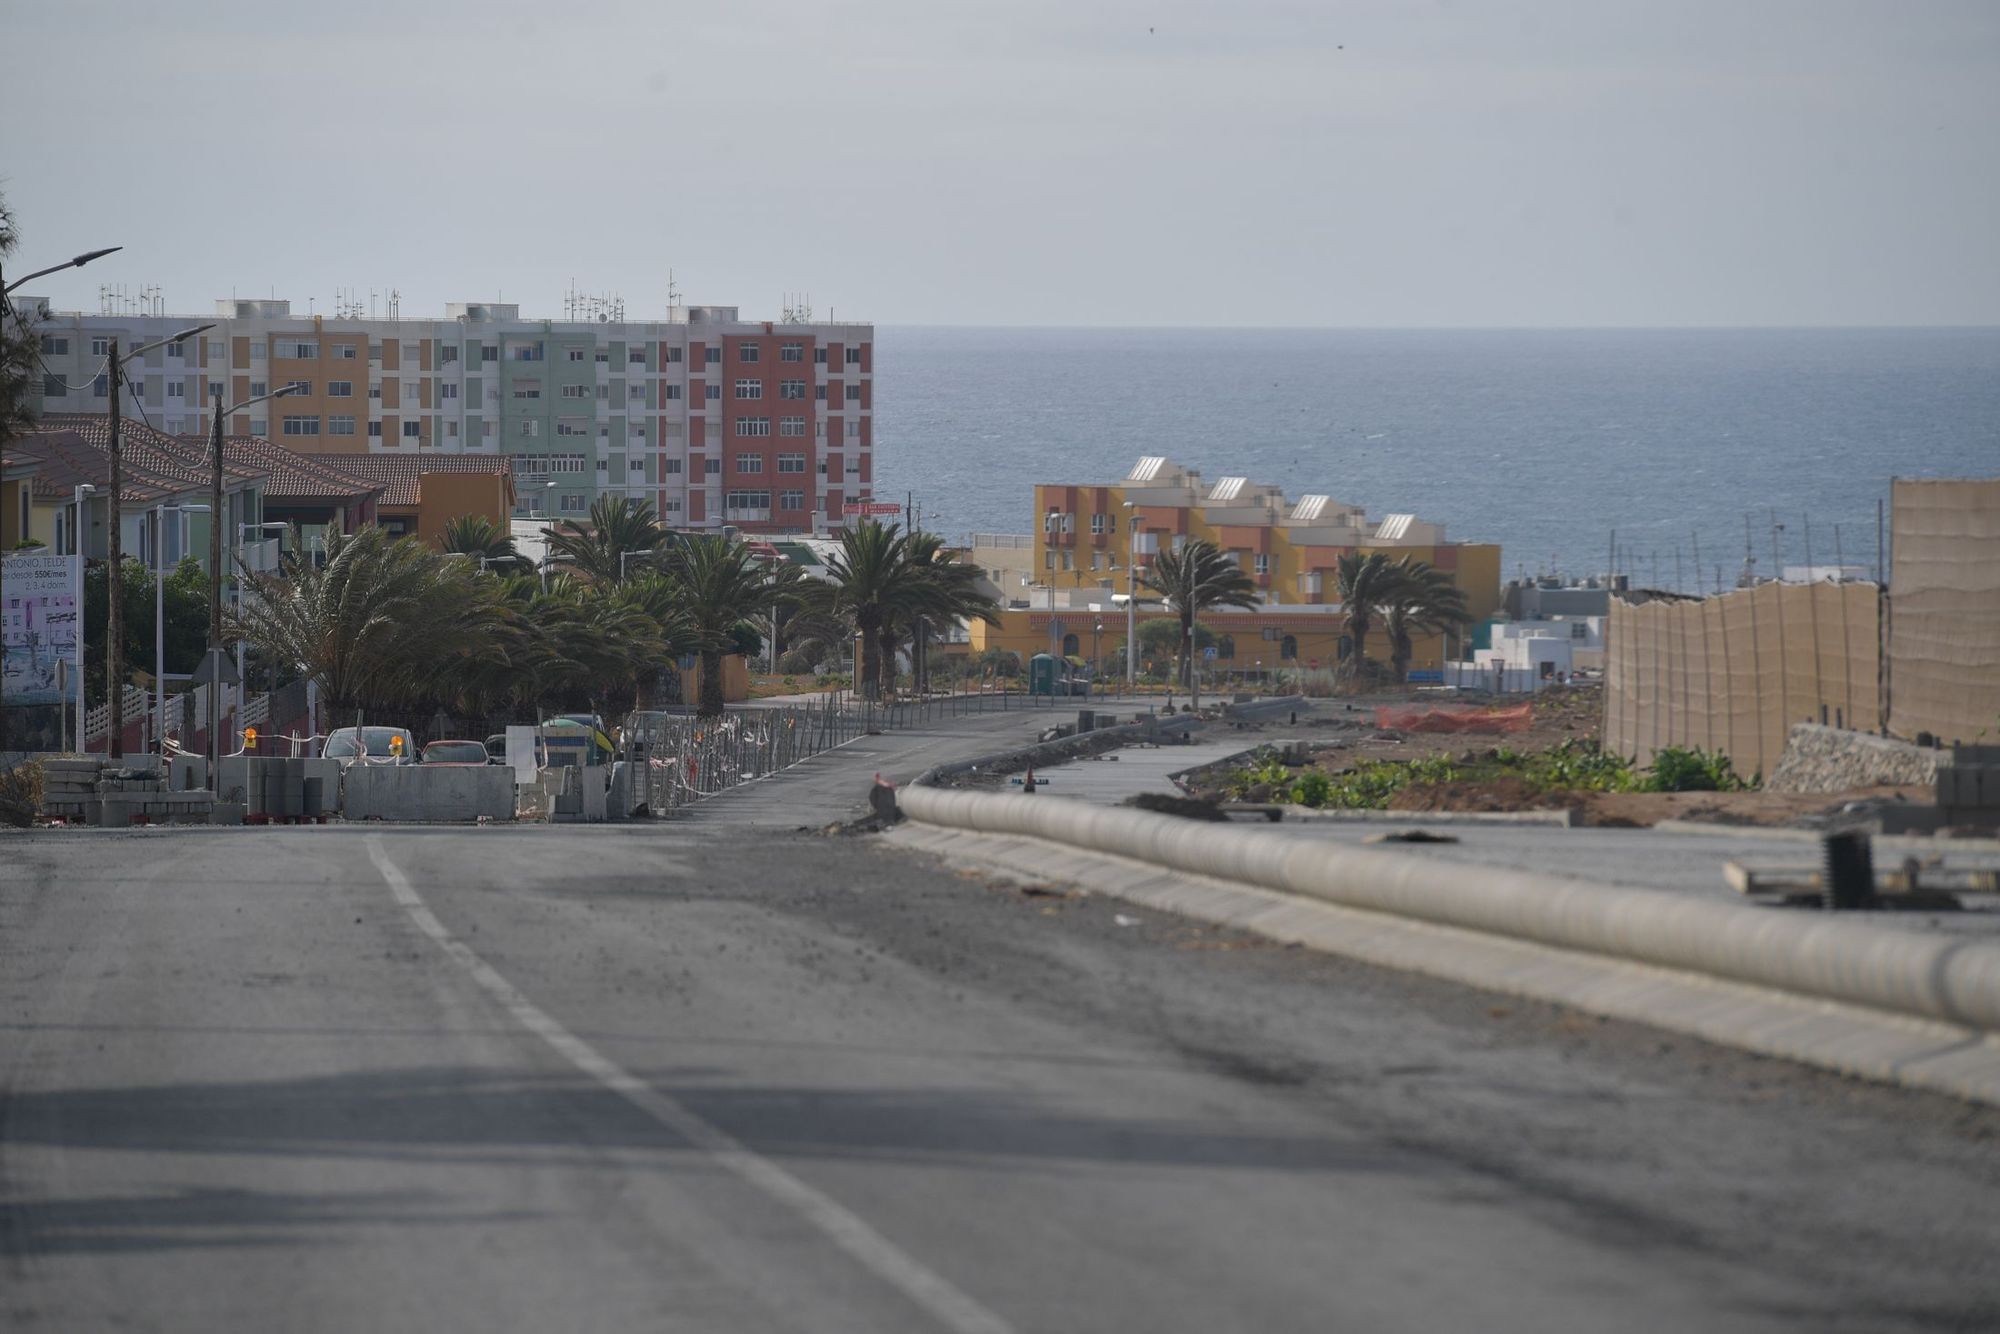 Así está el ensanche de la carretera de Melenara (02/07/21)